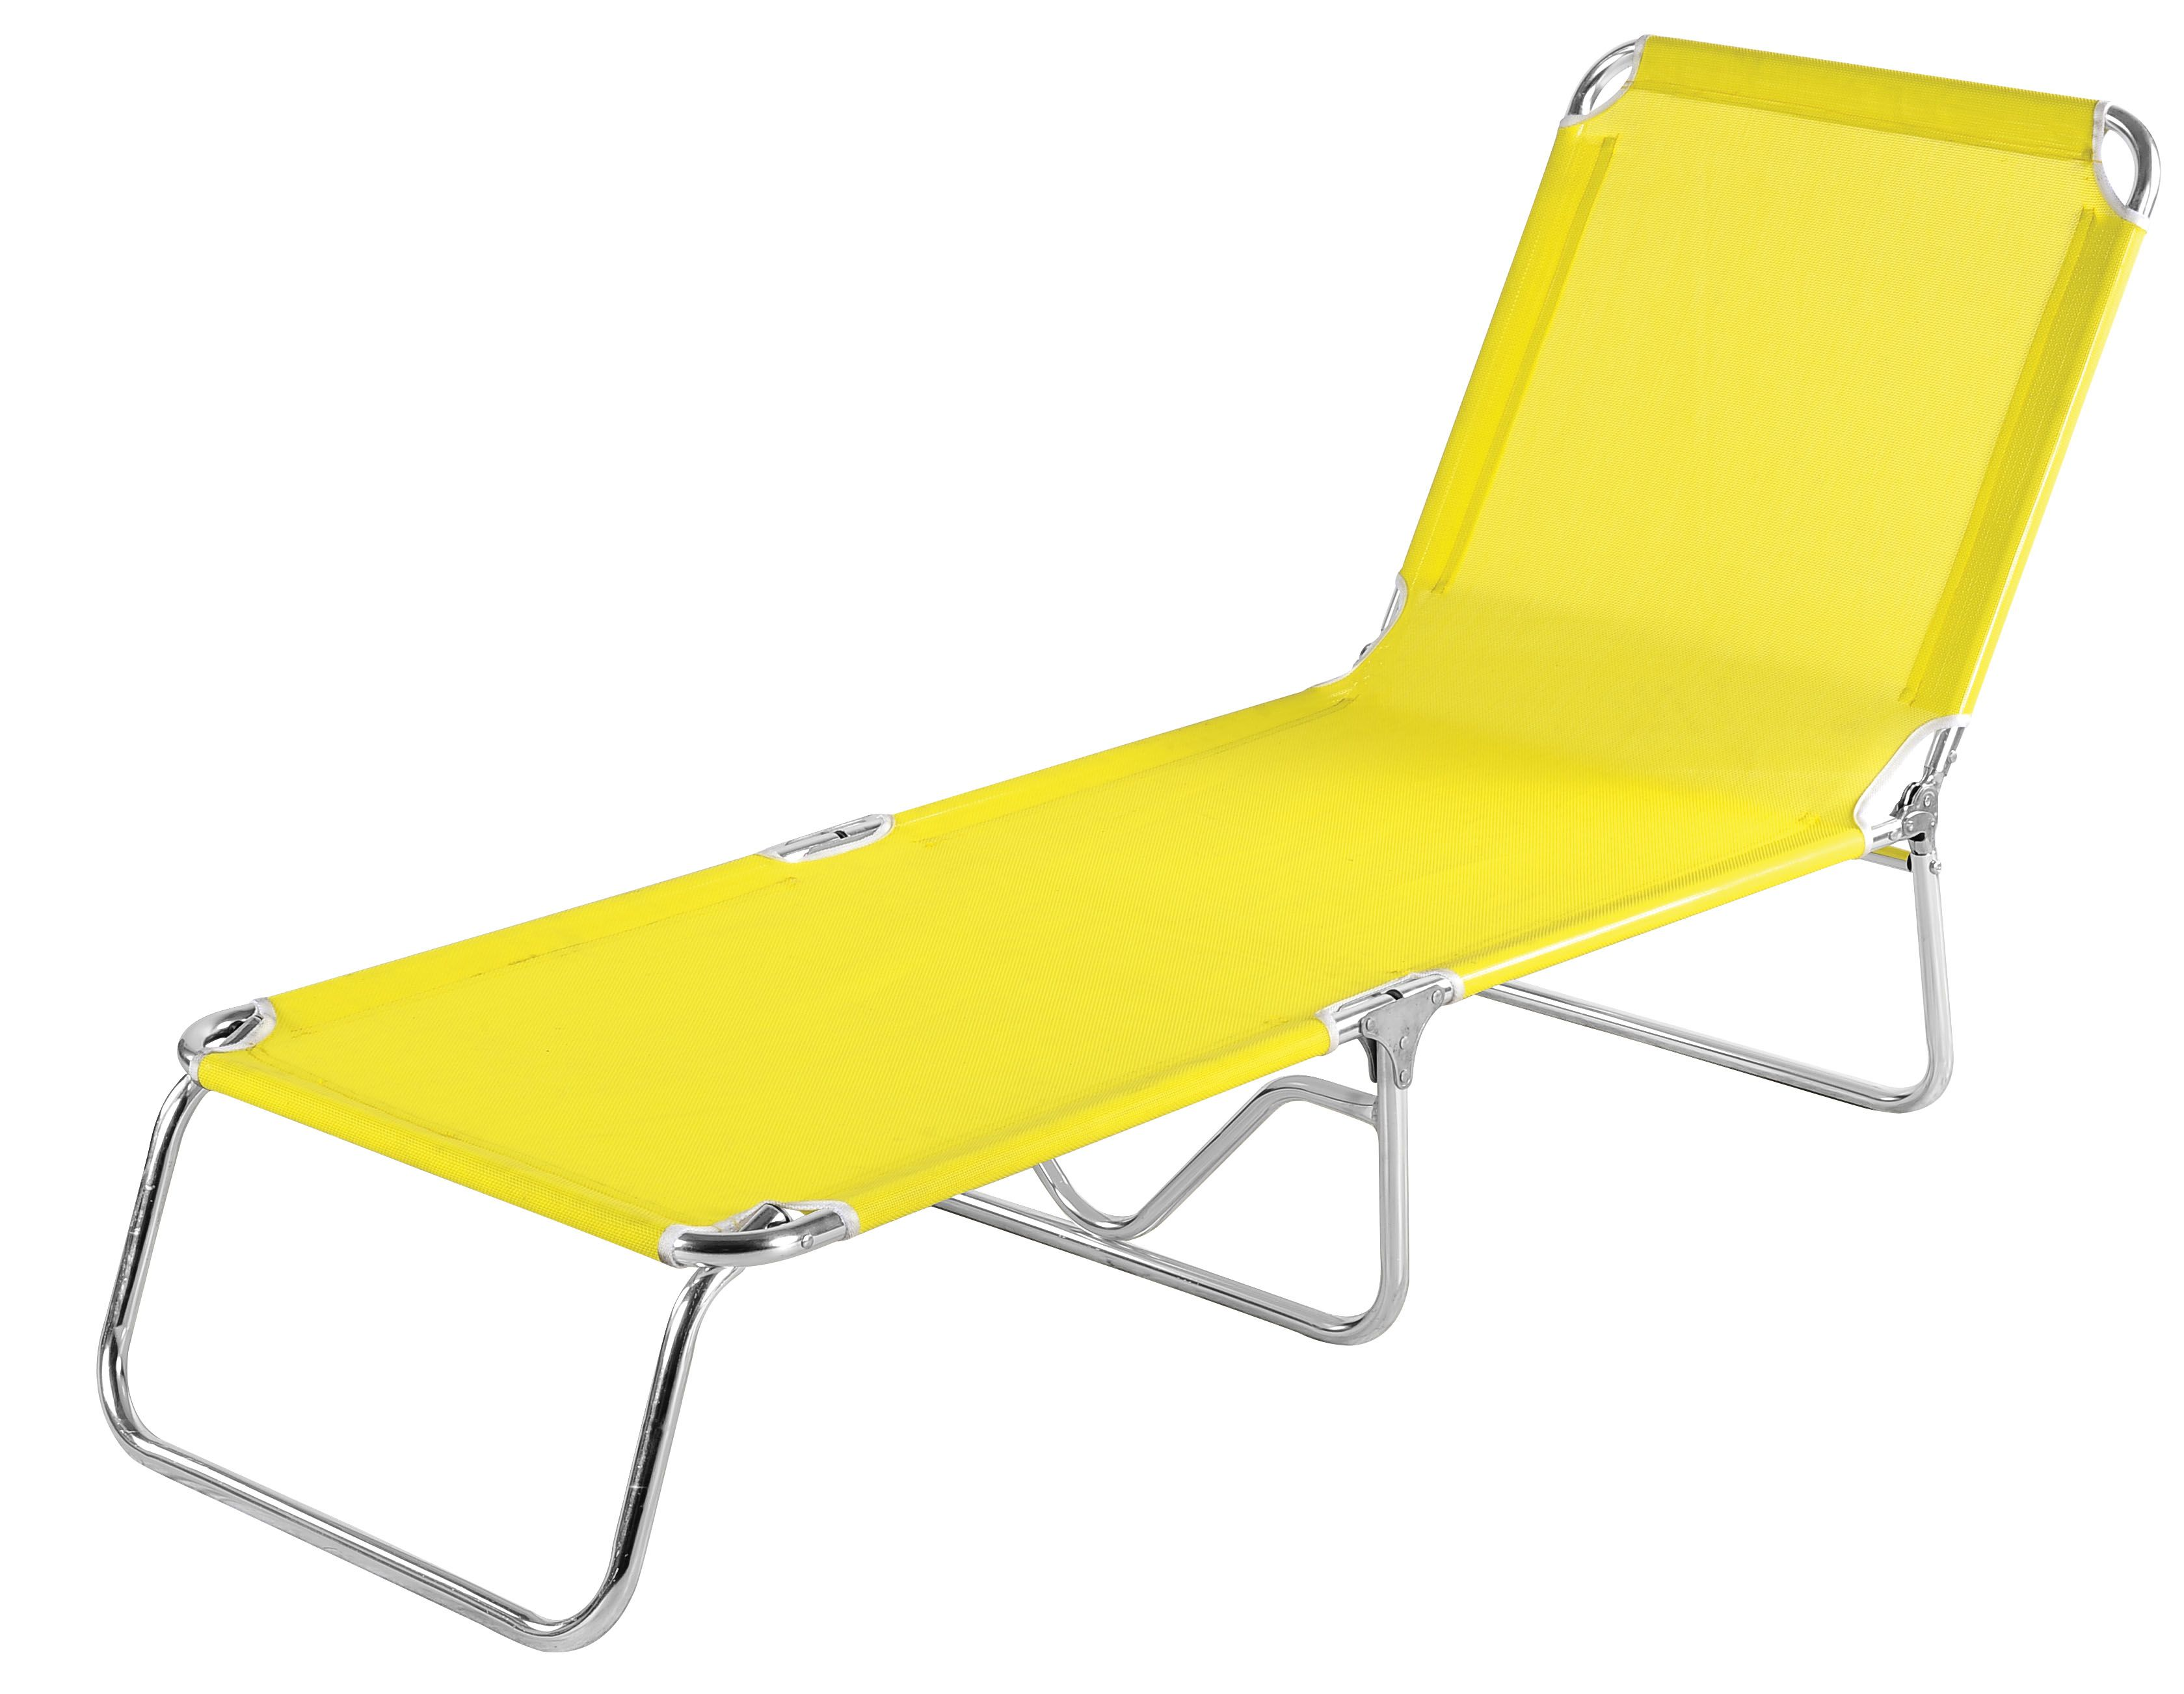 Colorful Loung Chair Folding Beach Lounge Chair Beach Lounge Chair Outdoor Chaise Lounge